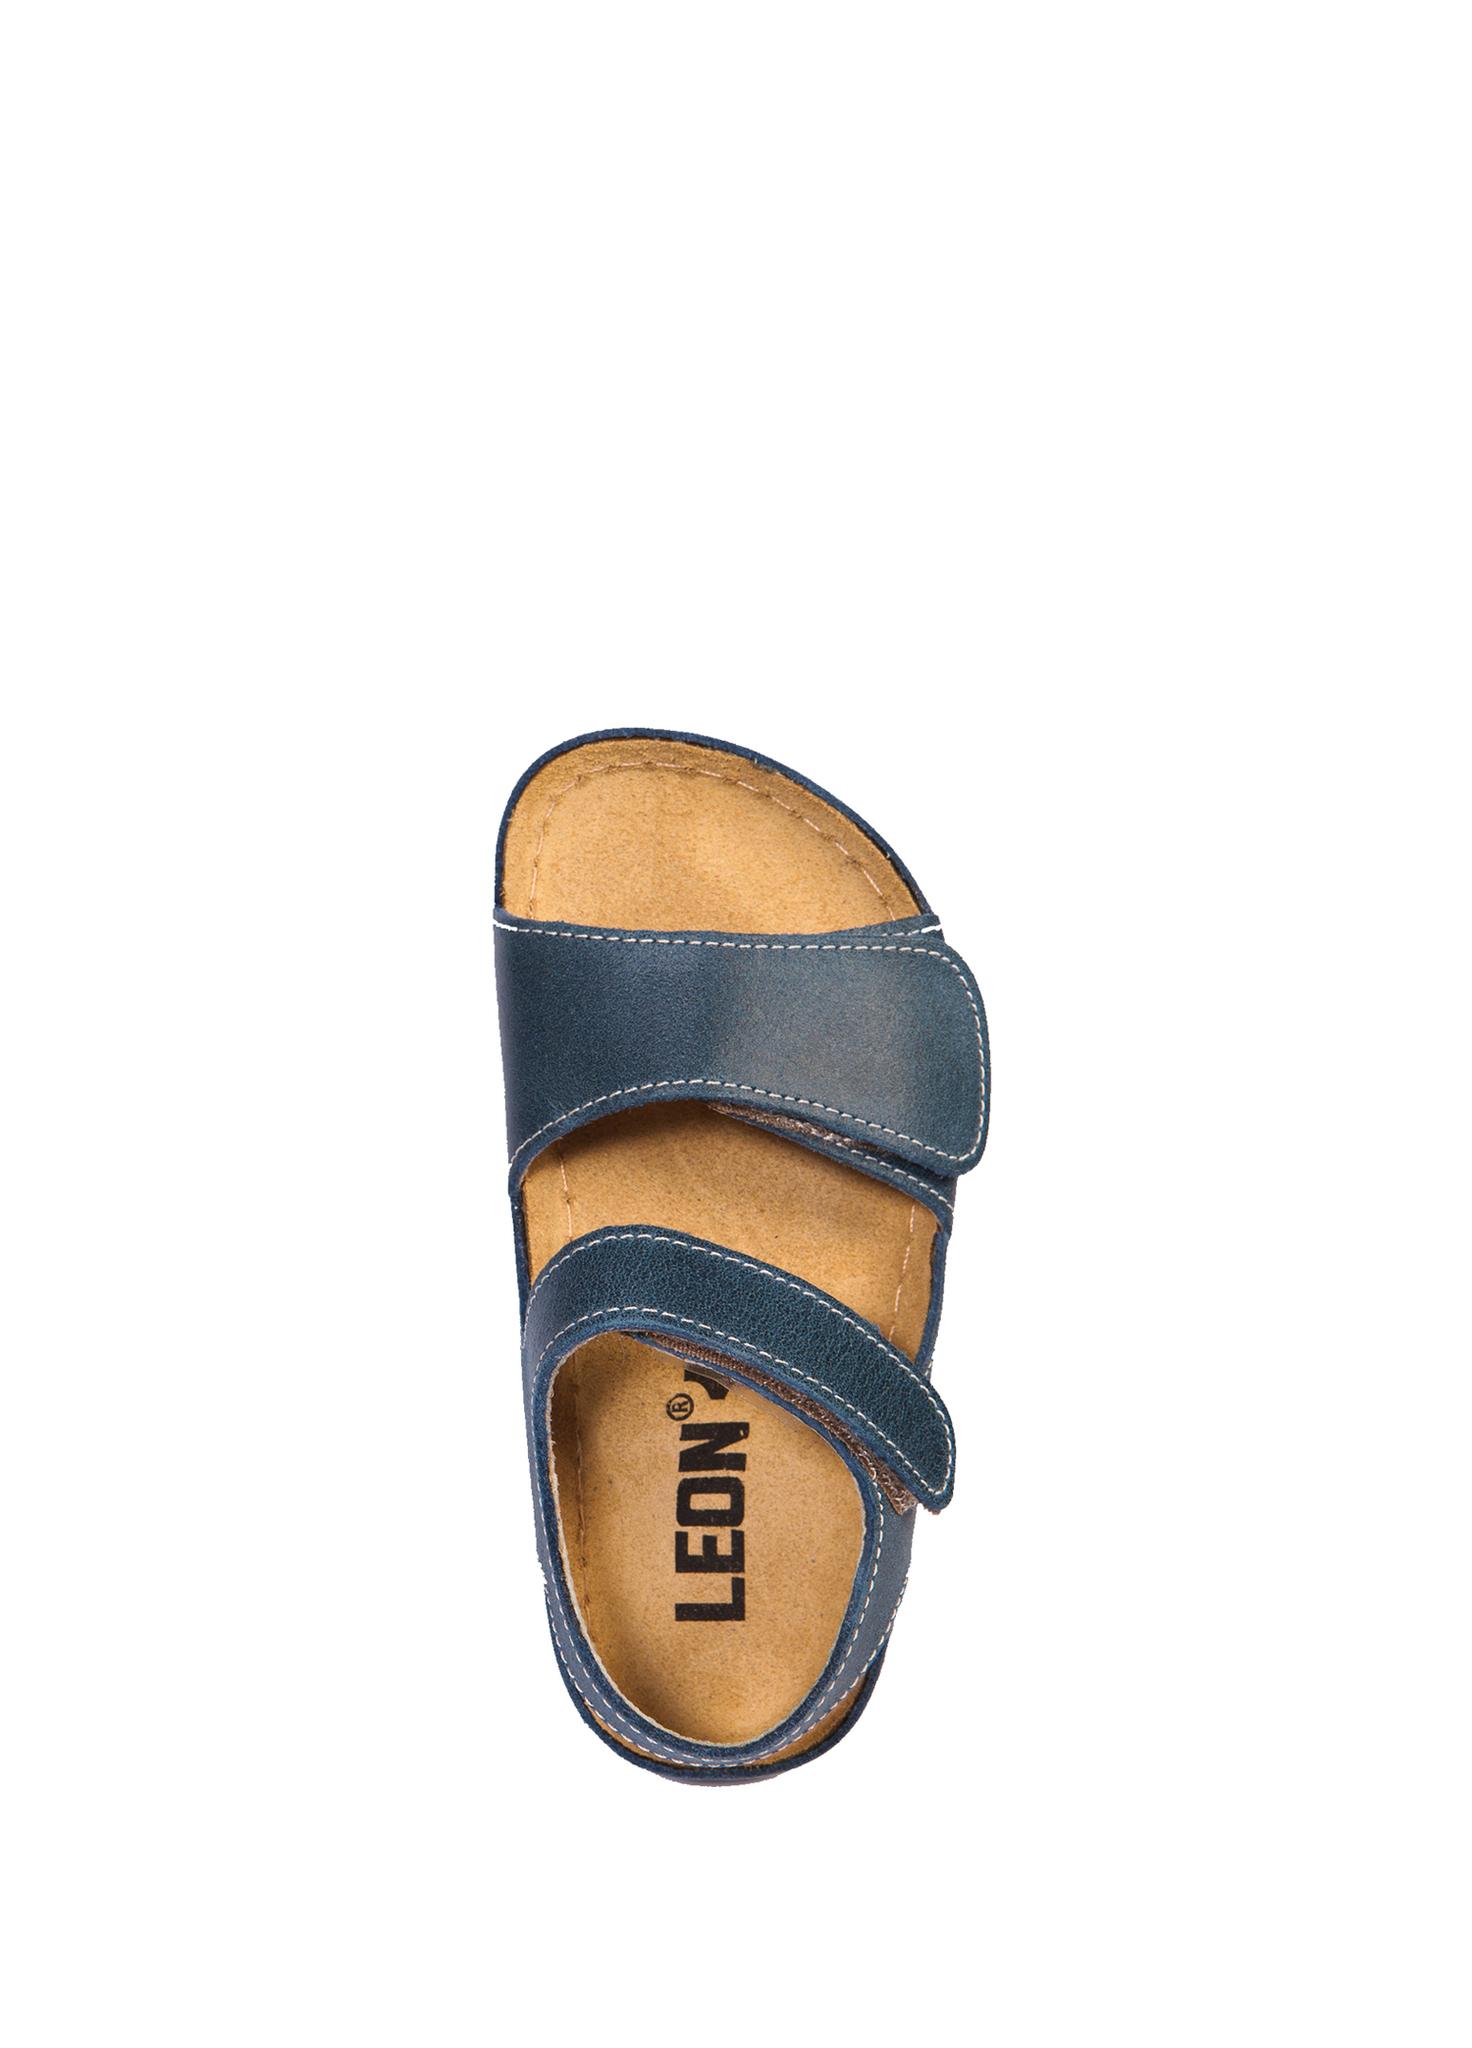 Детские сандалии LEON